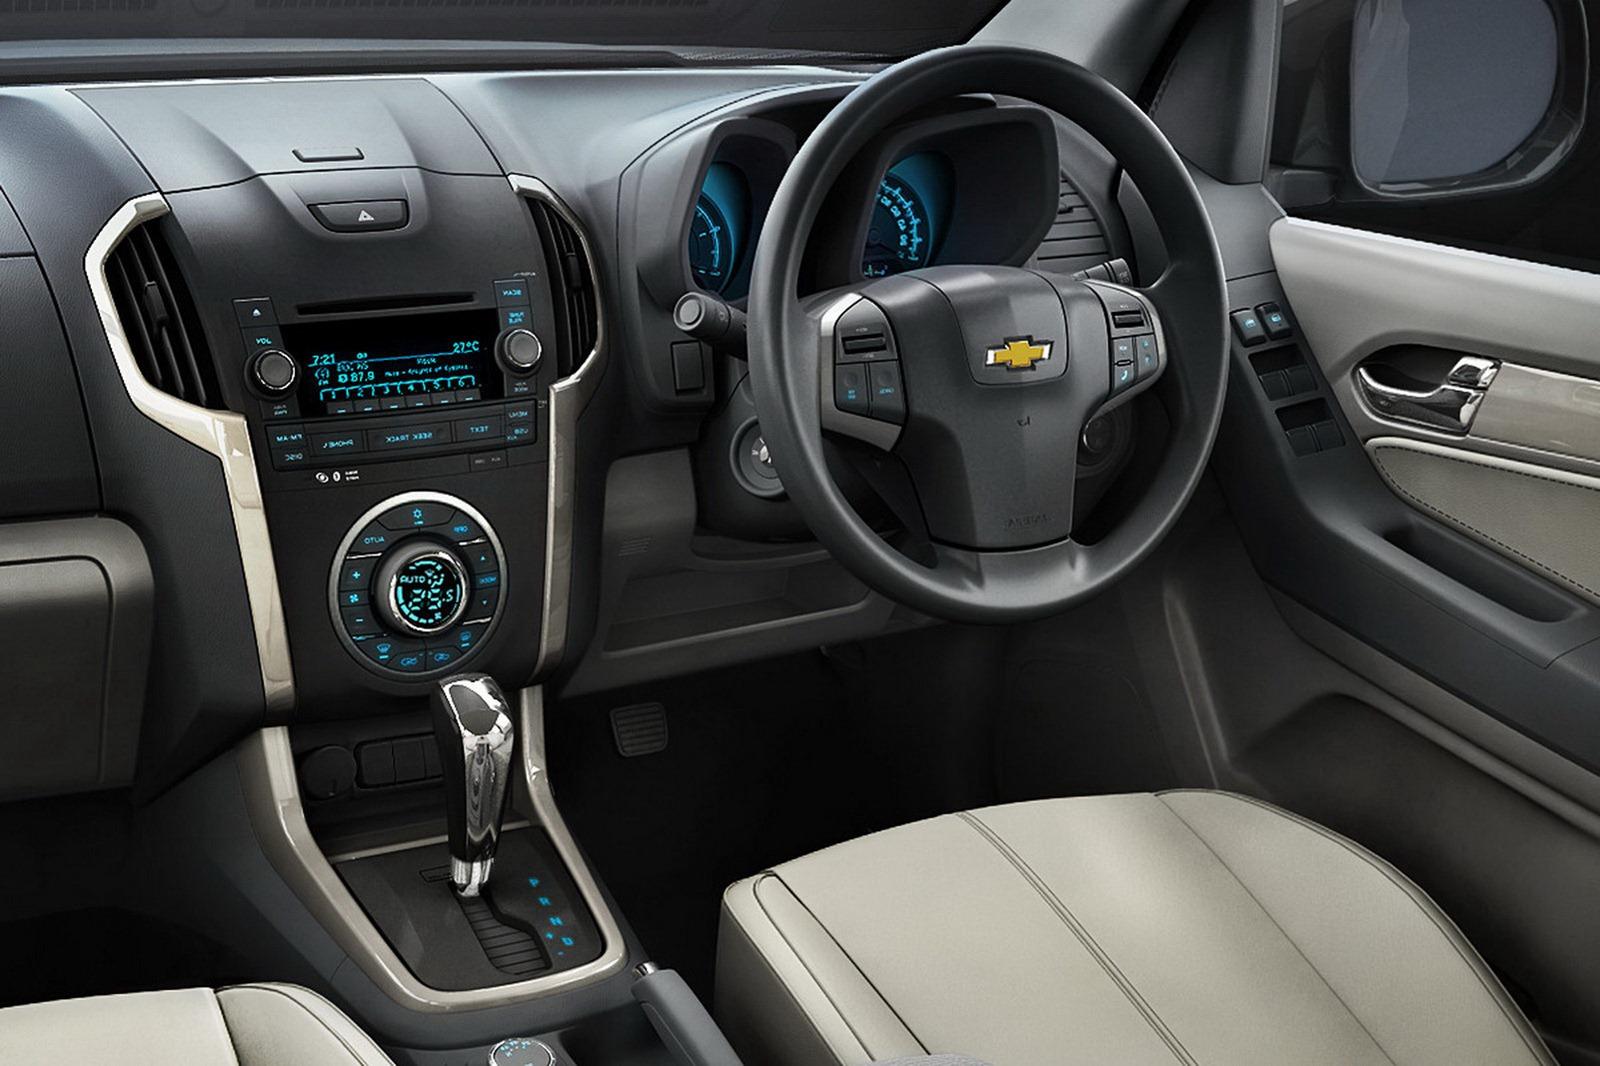 New 2013 Chevrolet Trailblazer Presented Us Launch